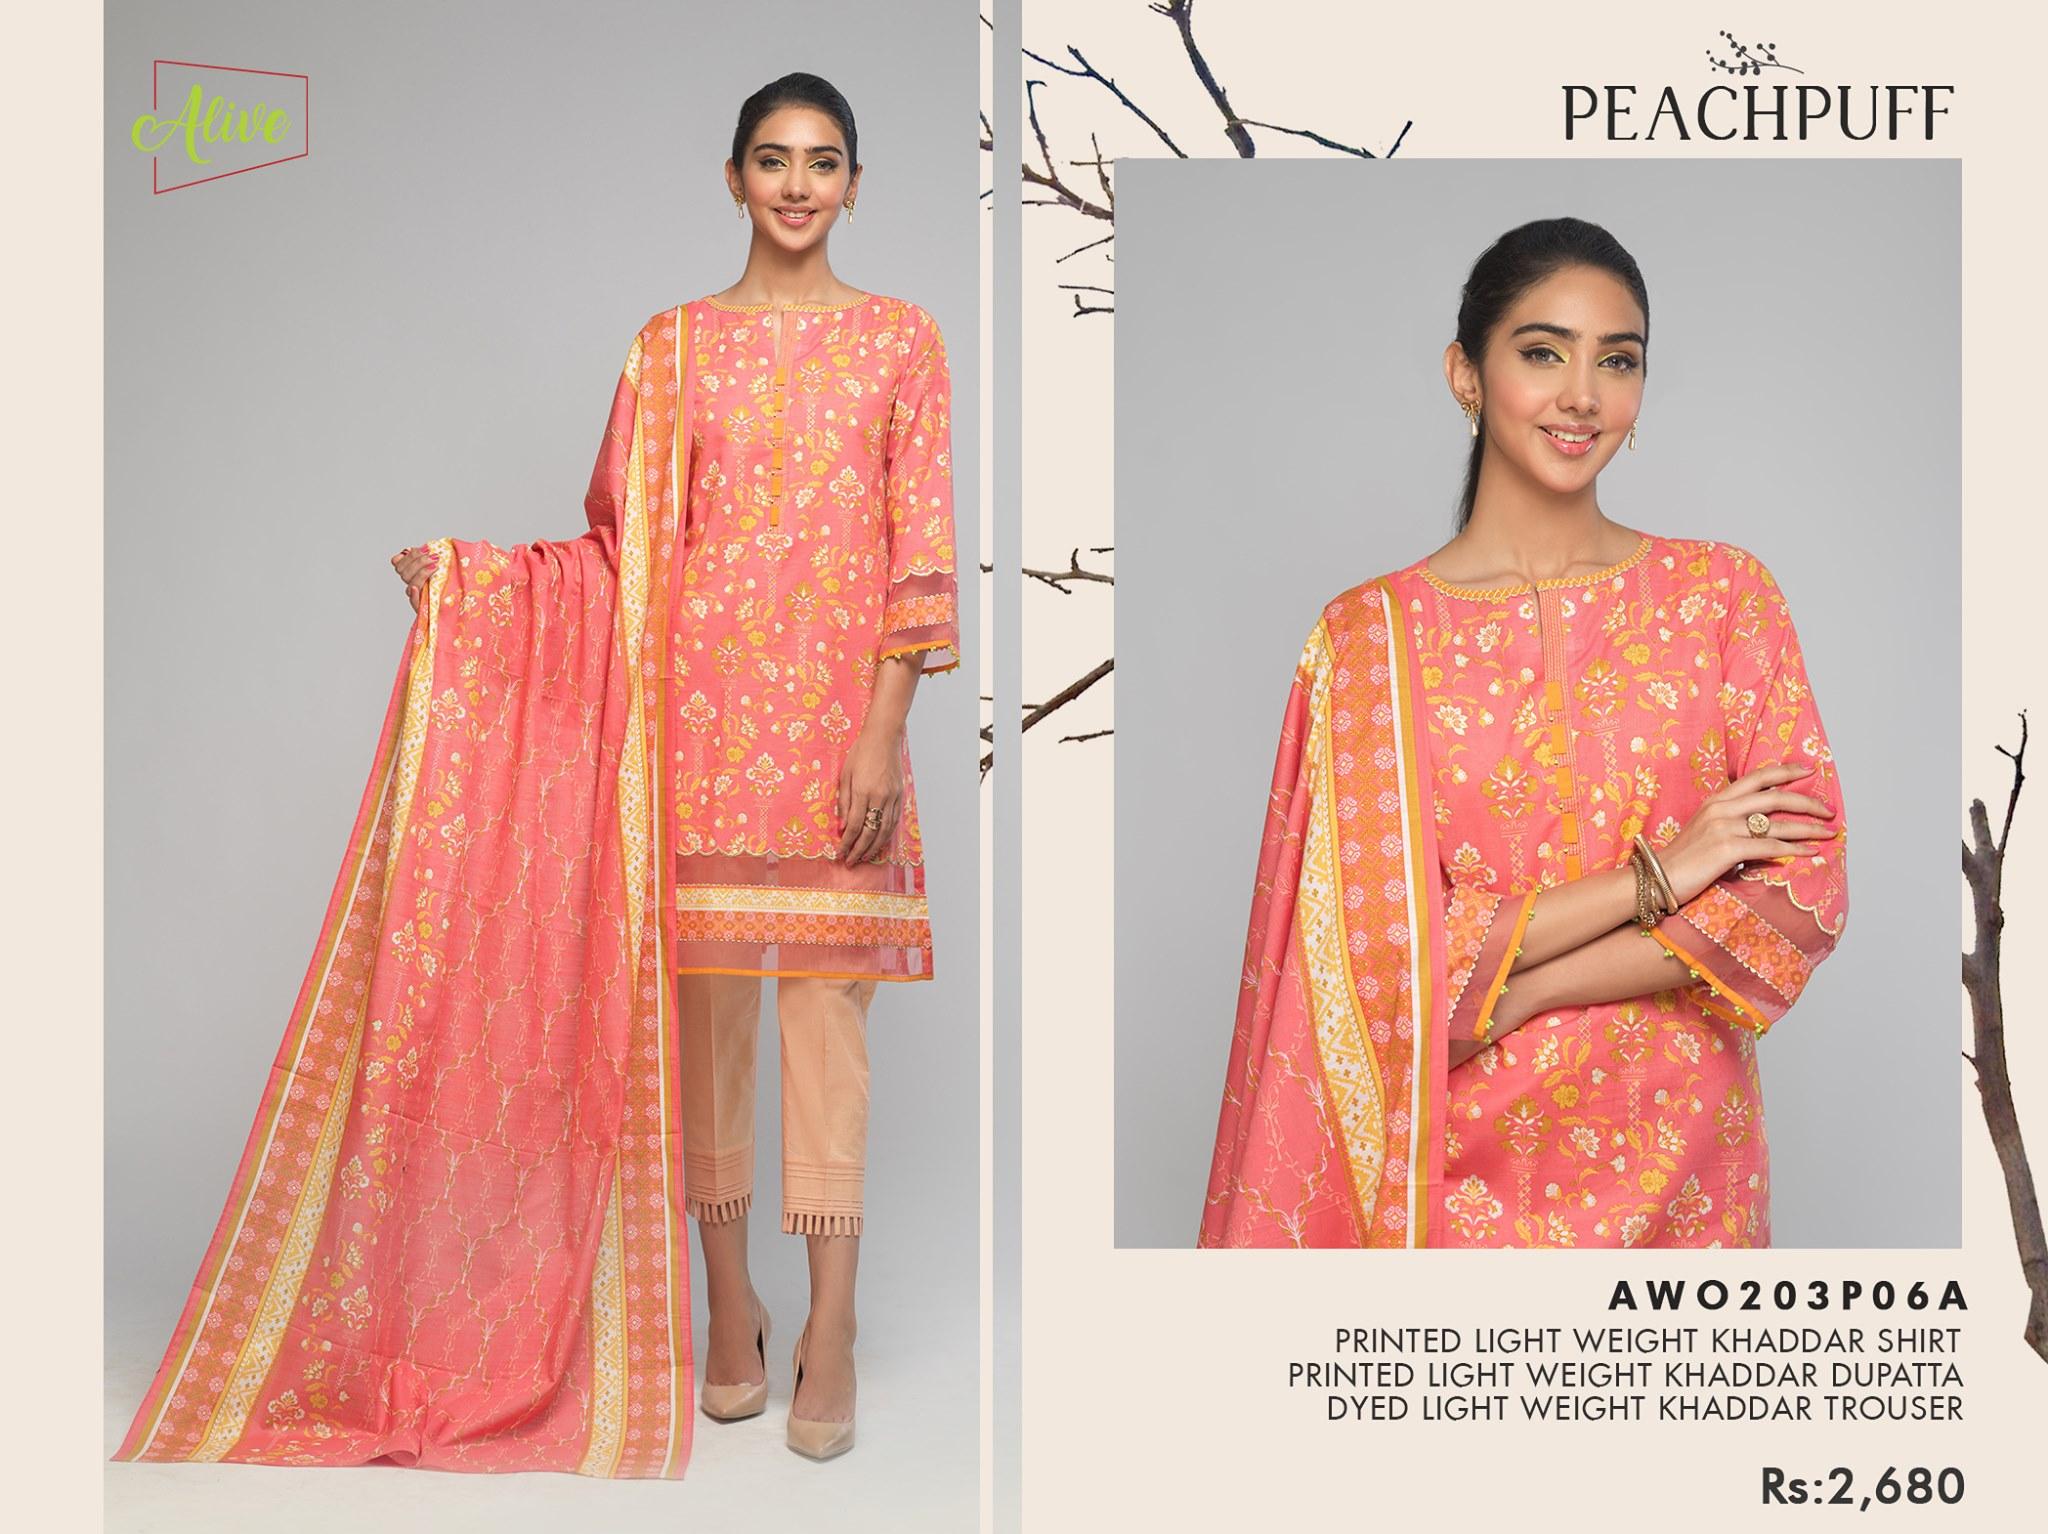 Bonanza Satrangi peach-puff Winter Dress 2021